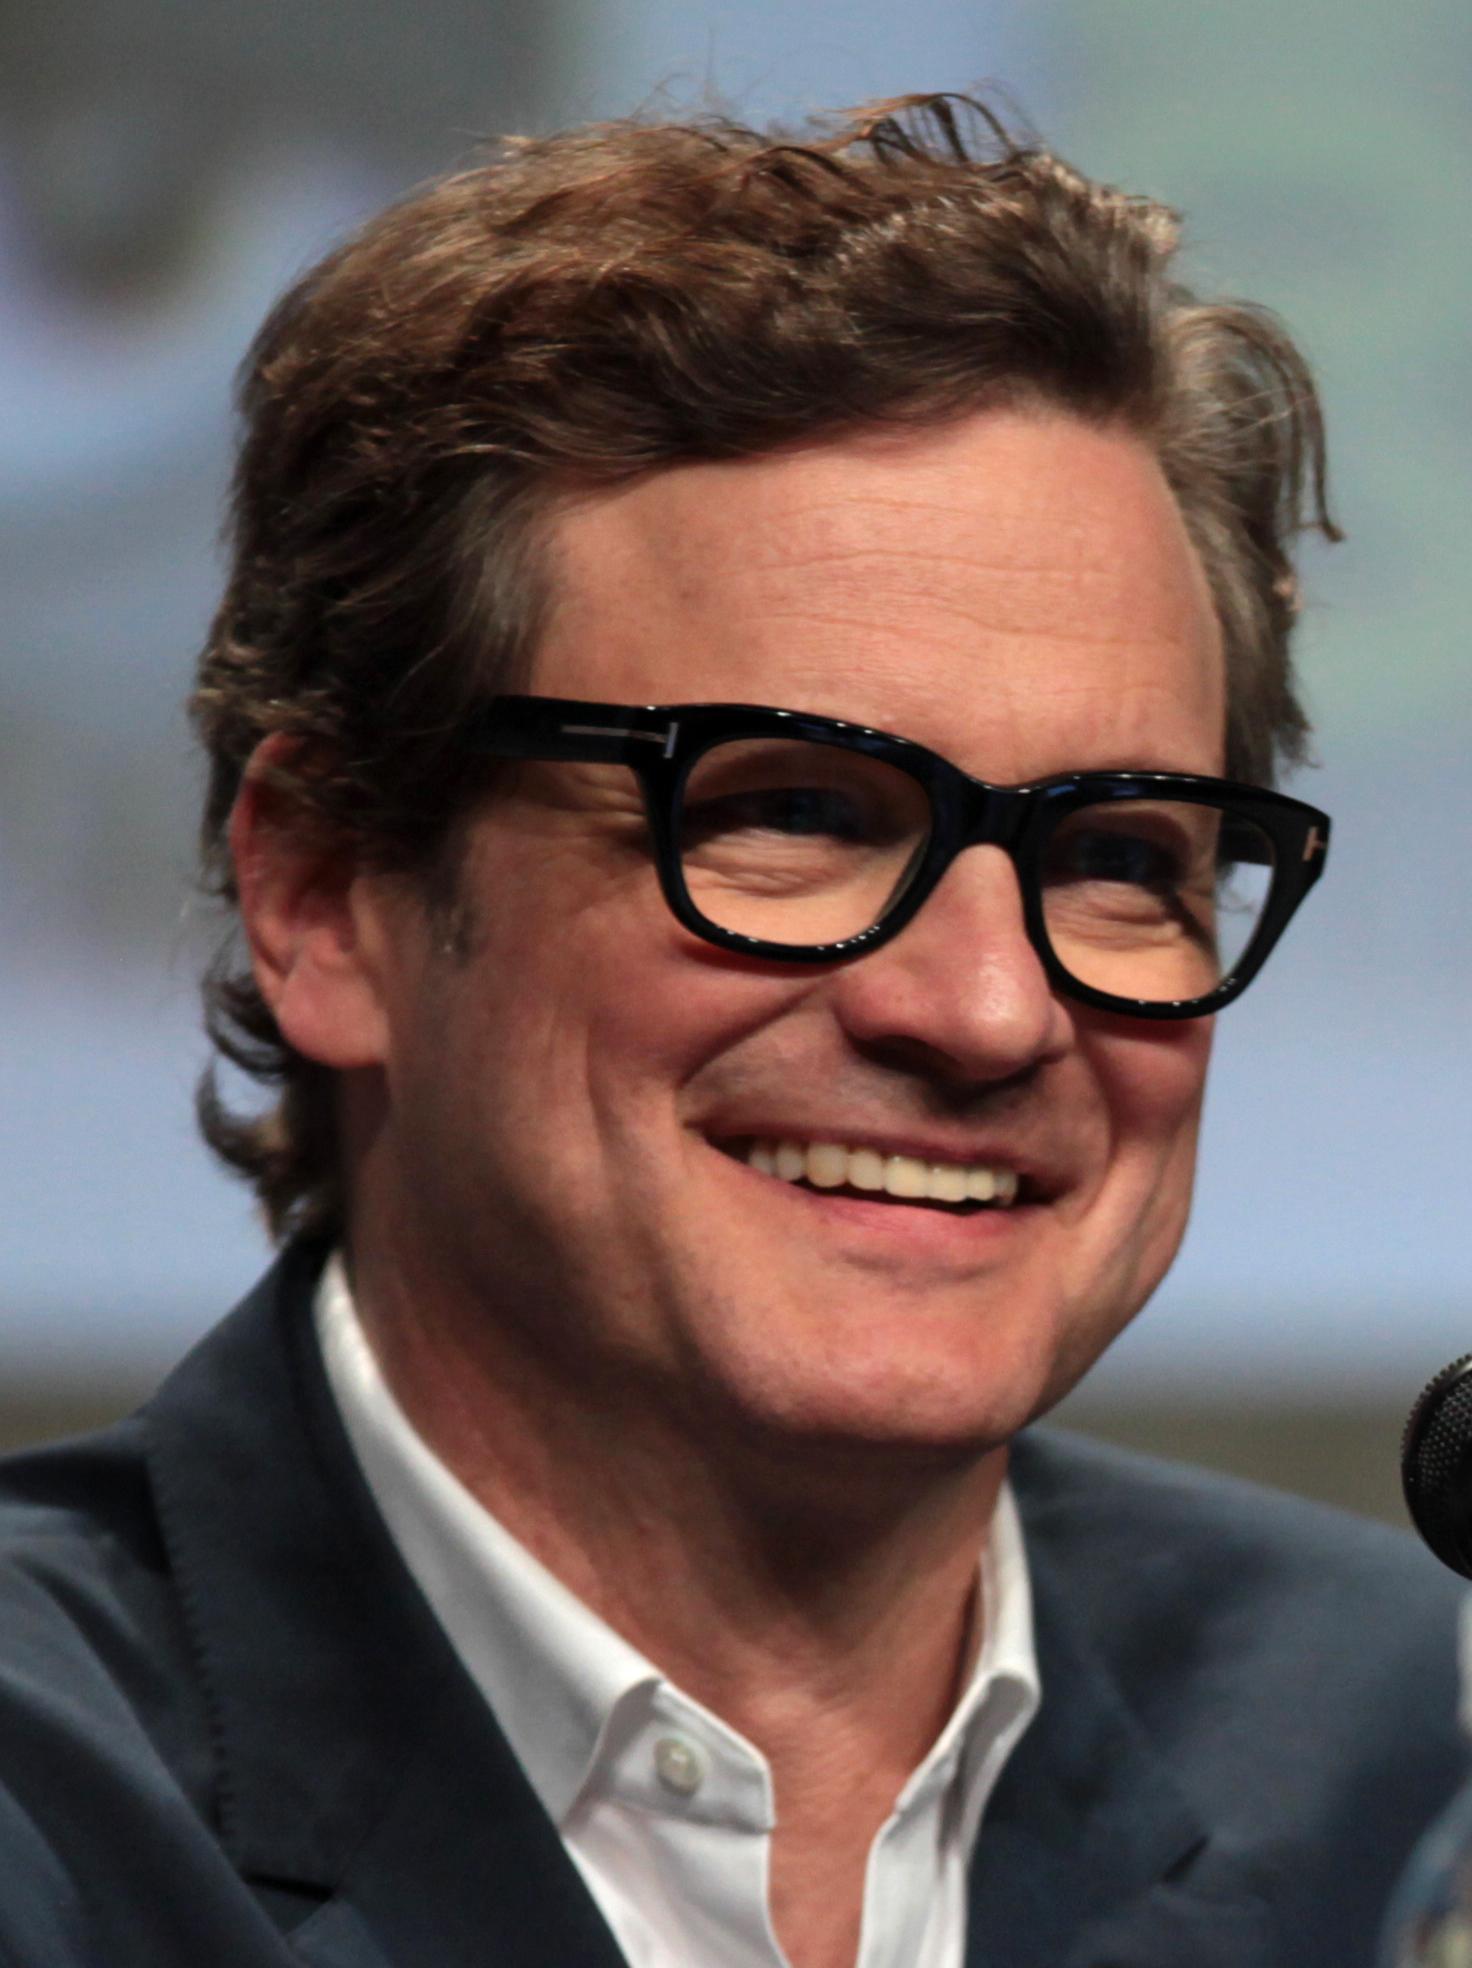 Colin Firth, ingiliz oyuncu tarihte bugün